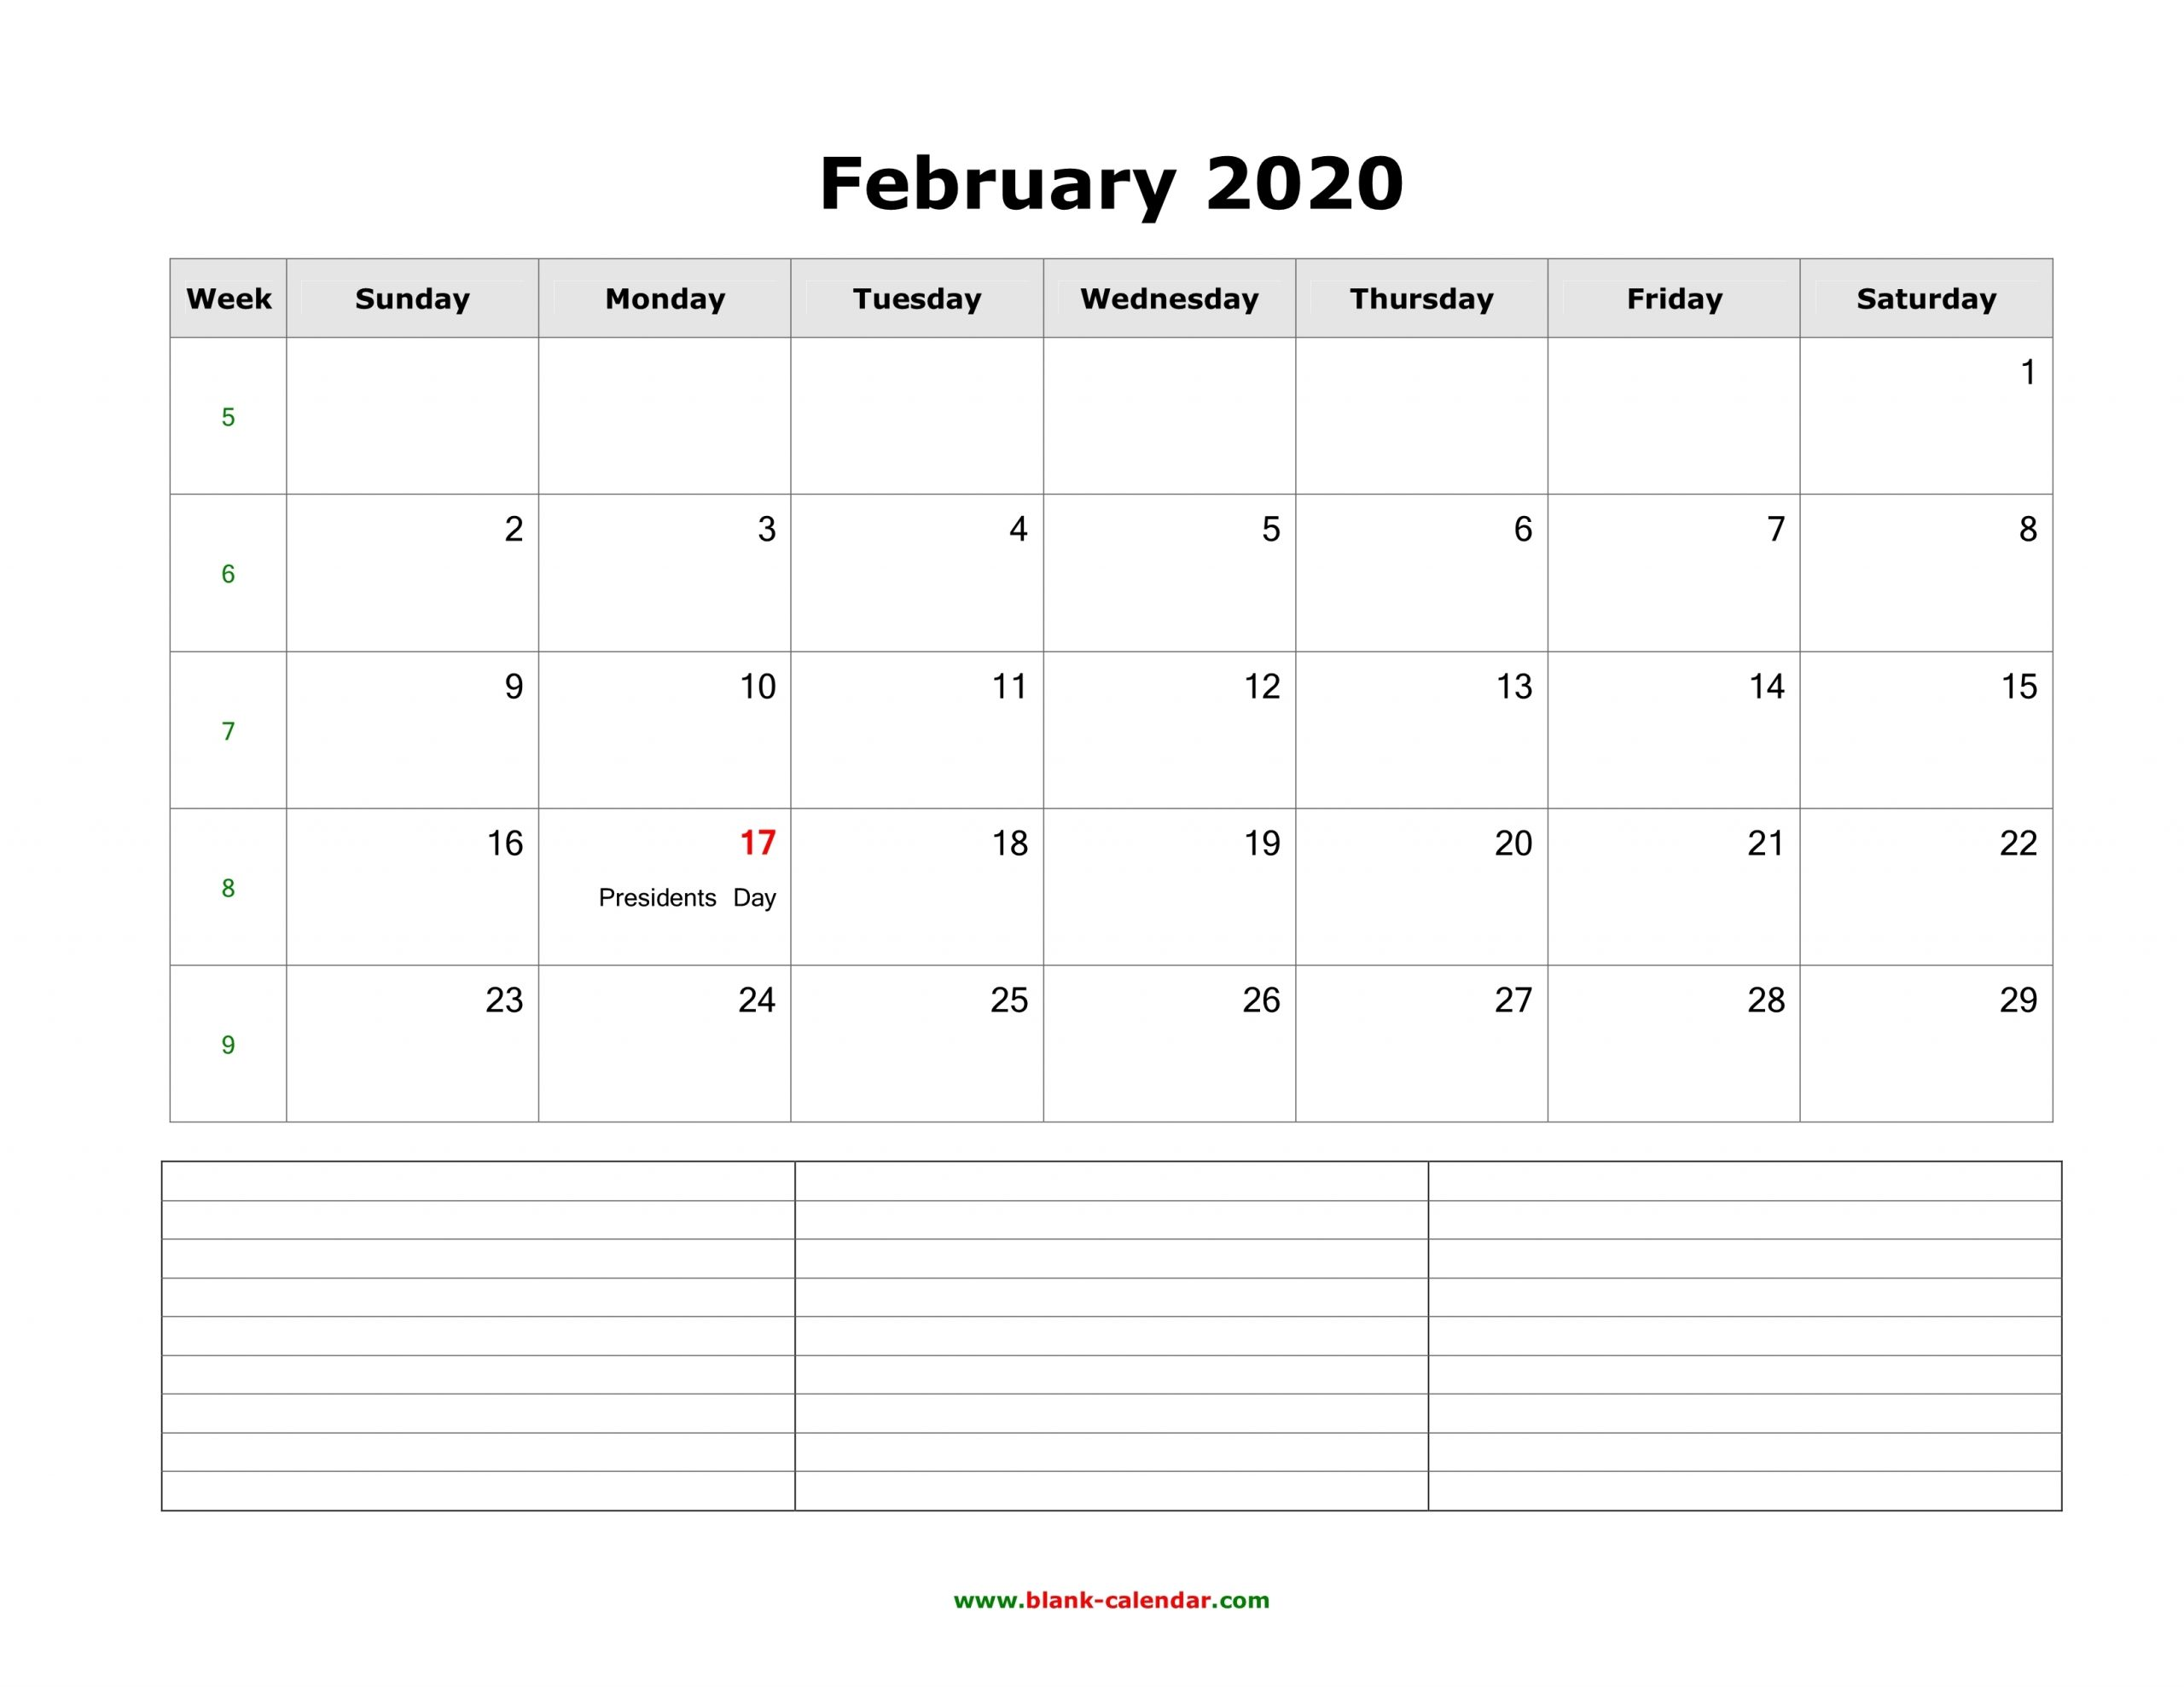 Free February 2020 Calendar Printable (Leap Year) - Blank Templates